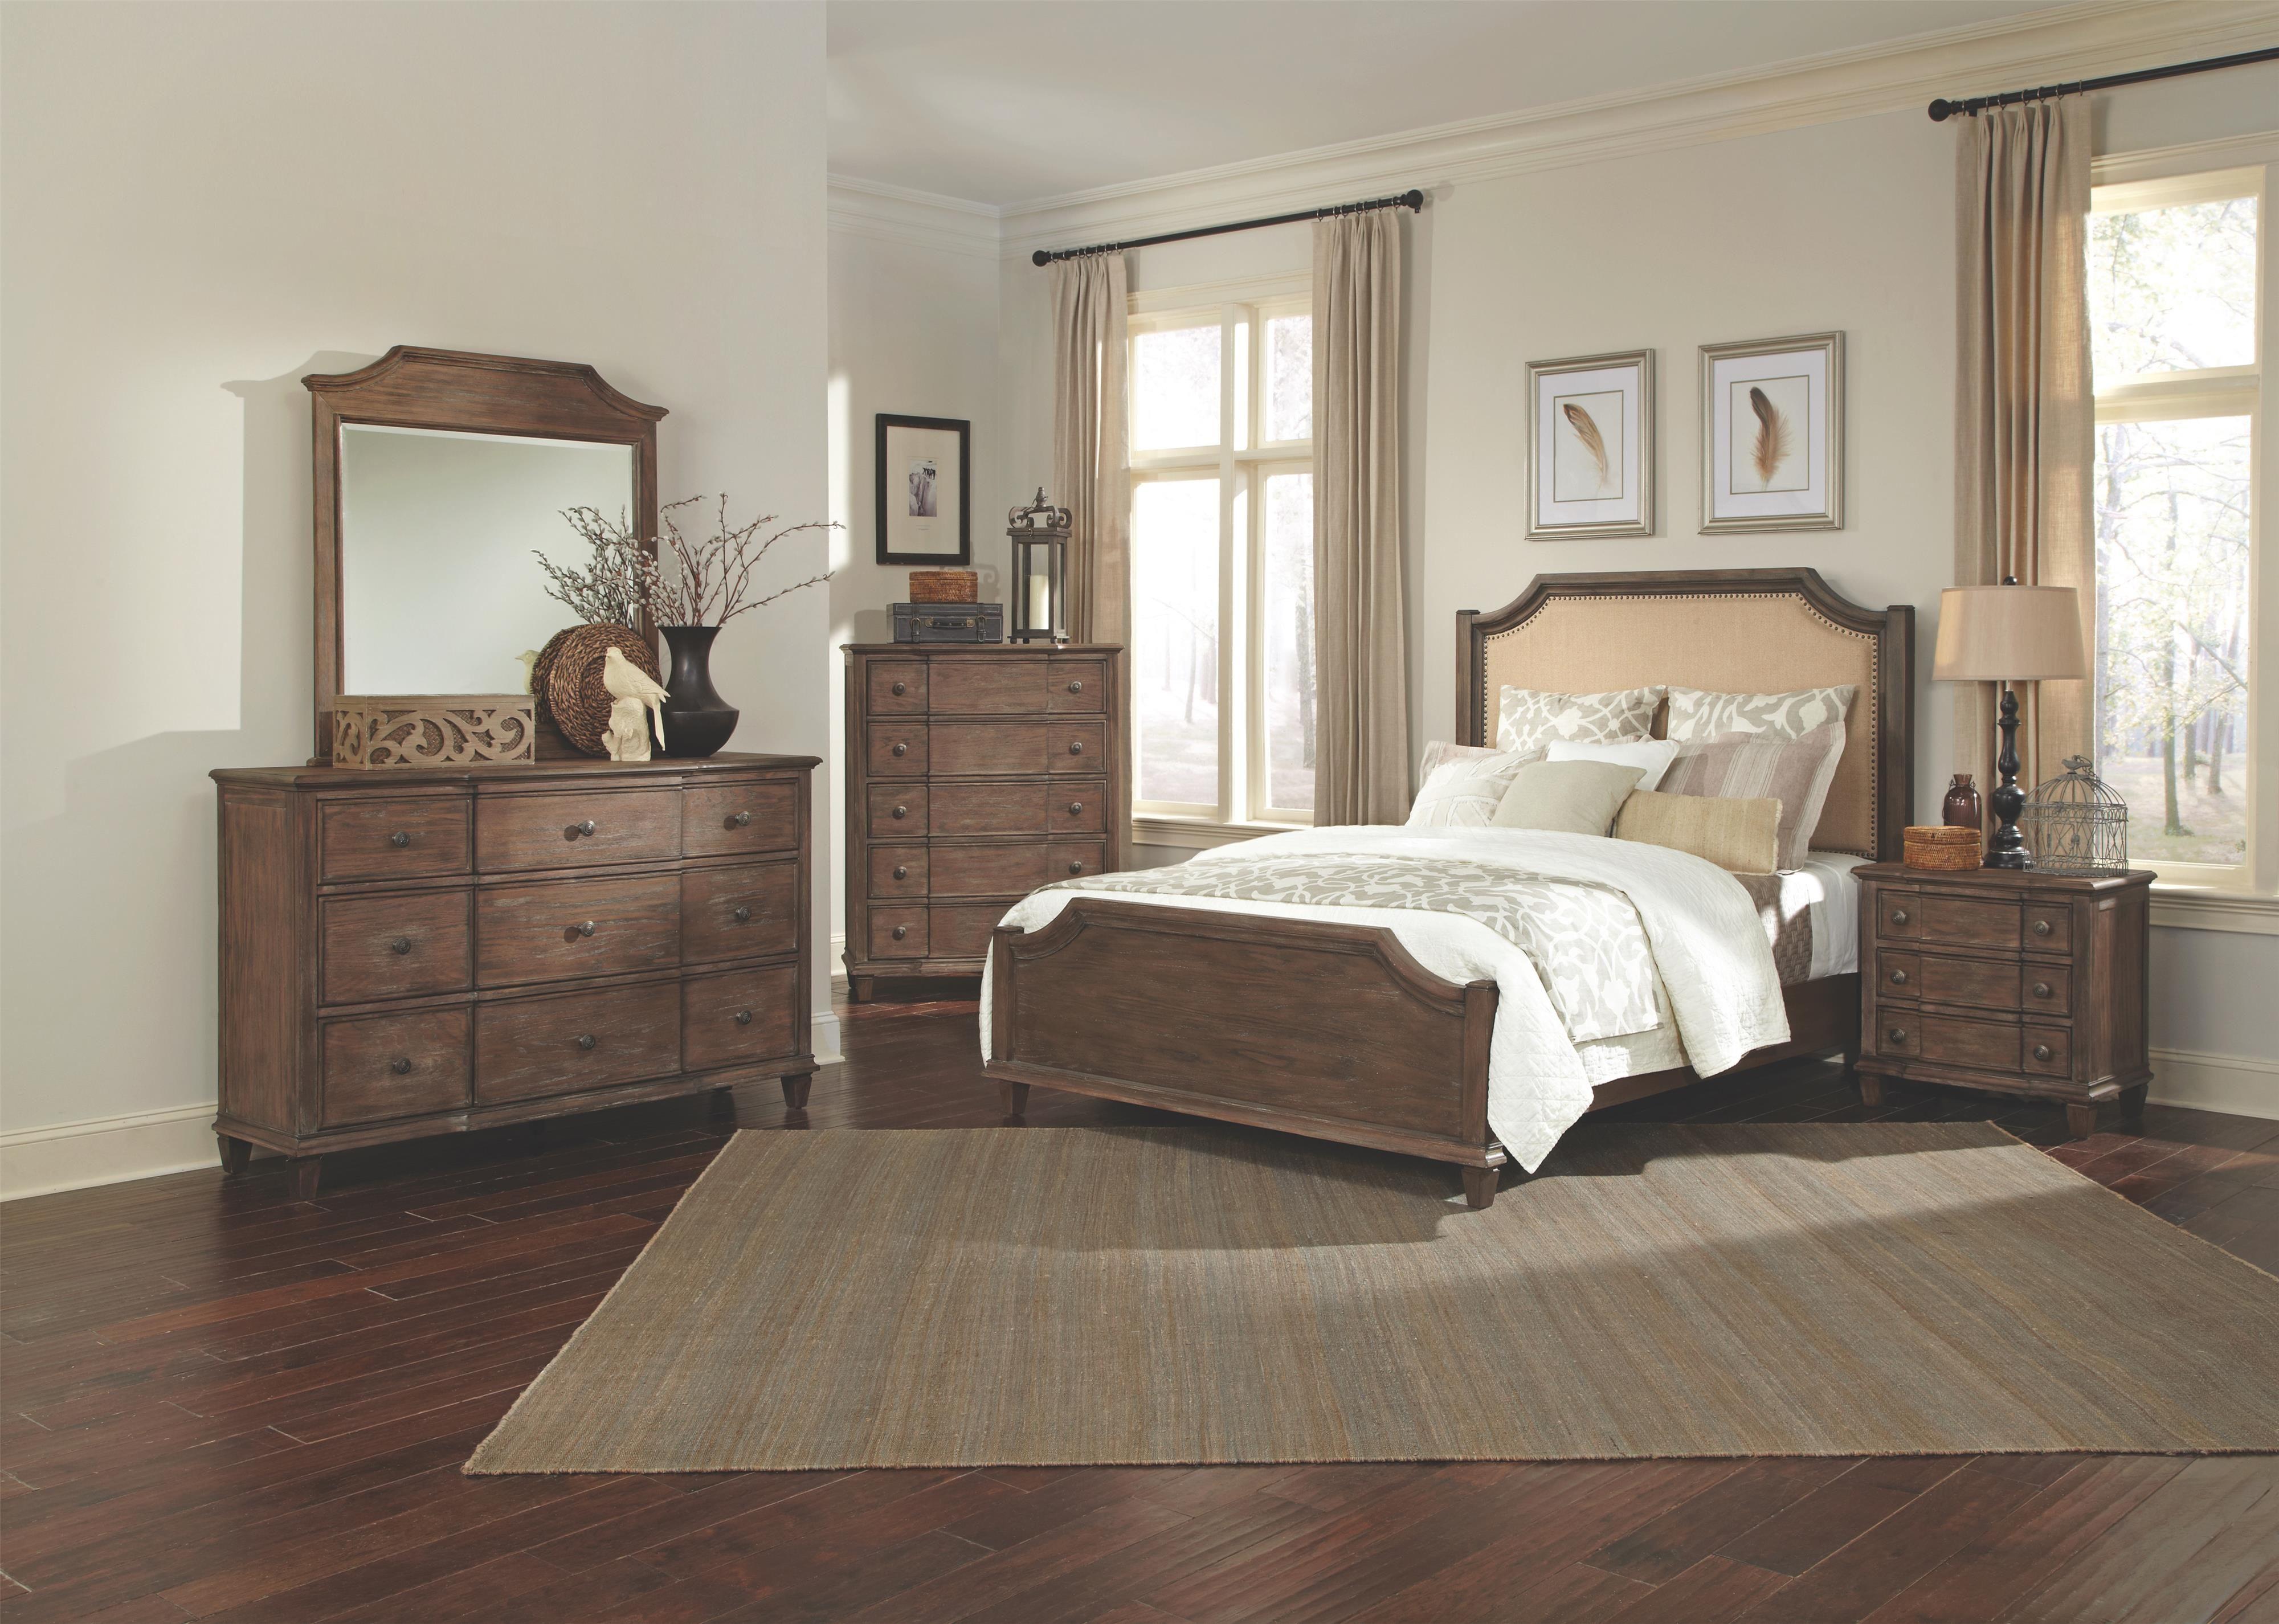 Dalgarno King Bedroom Group by Coaster   Master bedroom ...